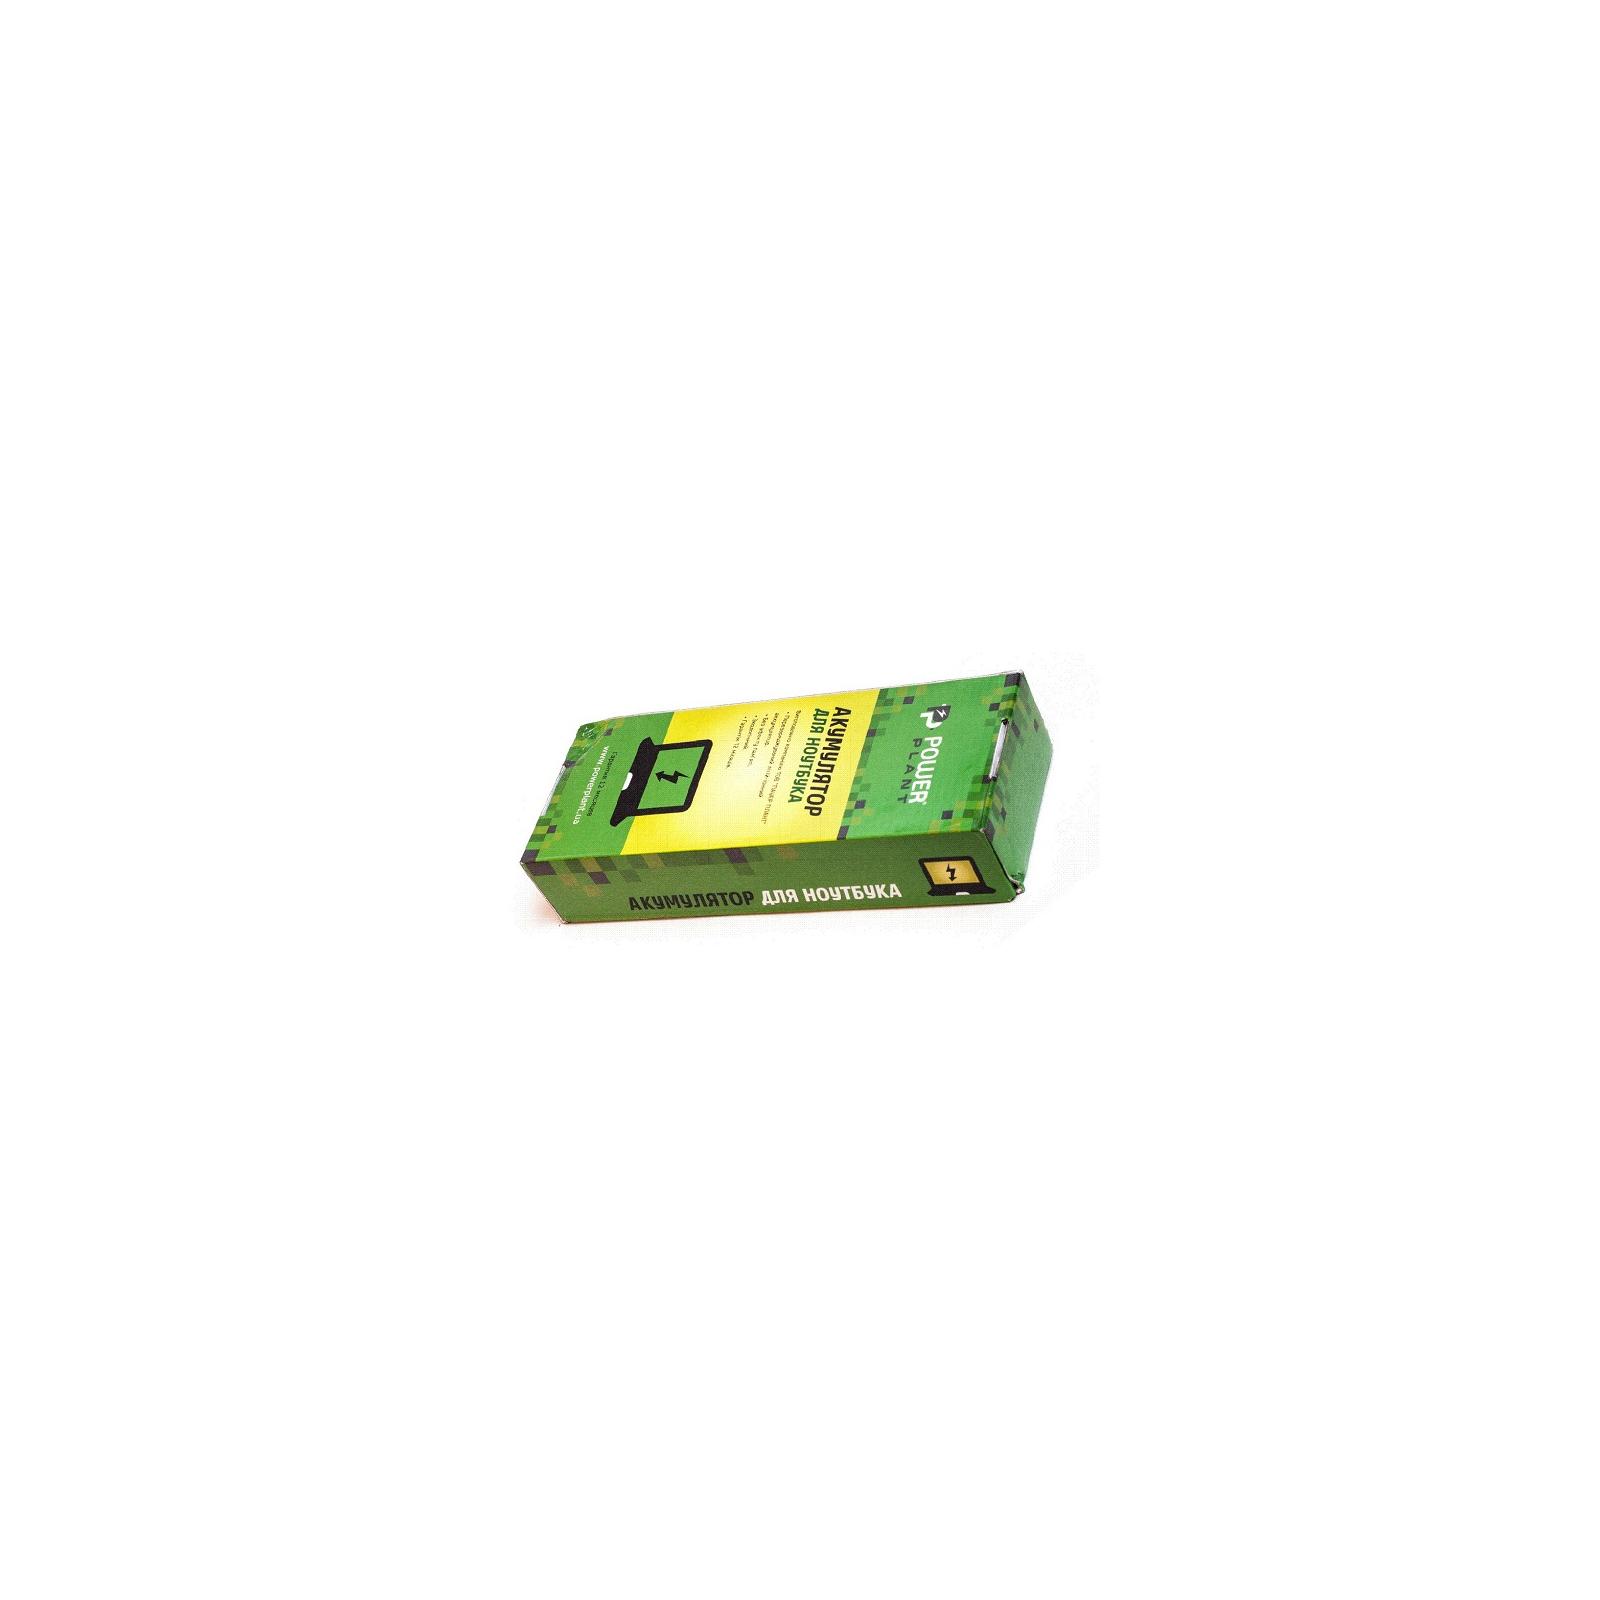 Аккумулятор для ноутбука LENOVO IdeaPad G460 (L09L6Y02 ,LE G460 3S2P) 11.1V 5200mAh PowerPlant (NB00000130) изображение 3